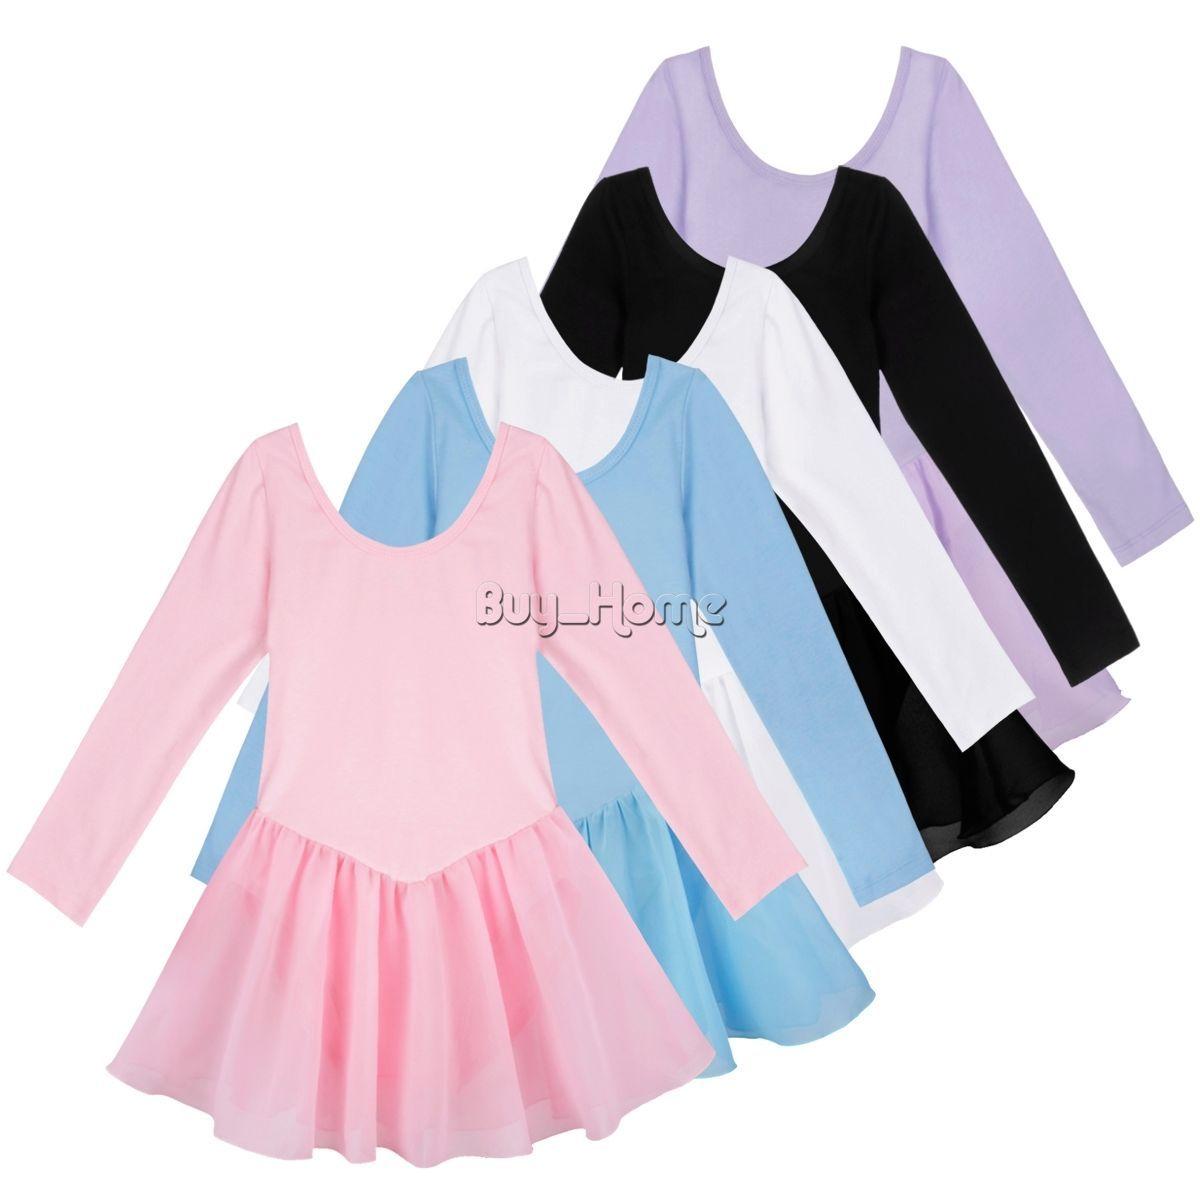 Kid Girl Ballet Dance Tutu Long Sleeve Dress Gymnastics Leotard Outfit Dancewear